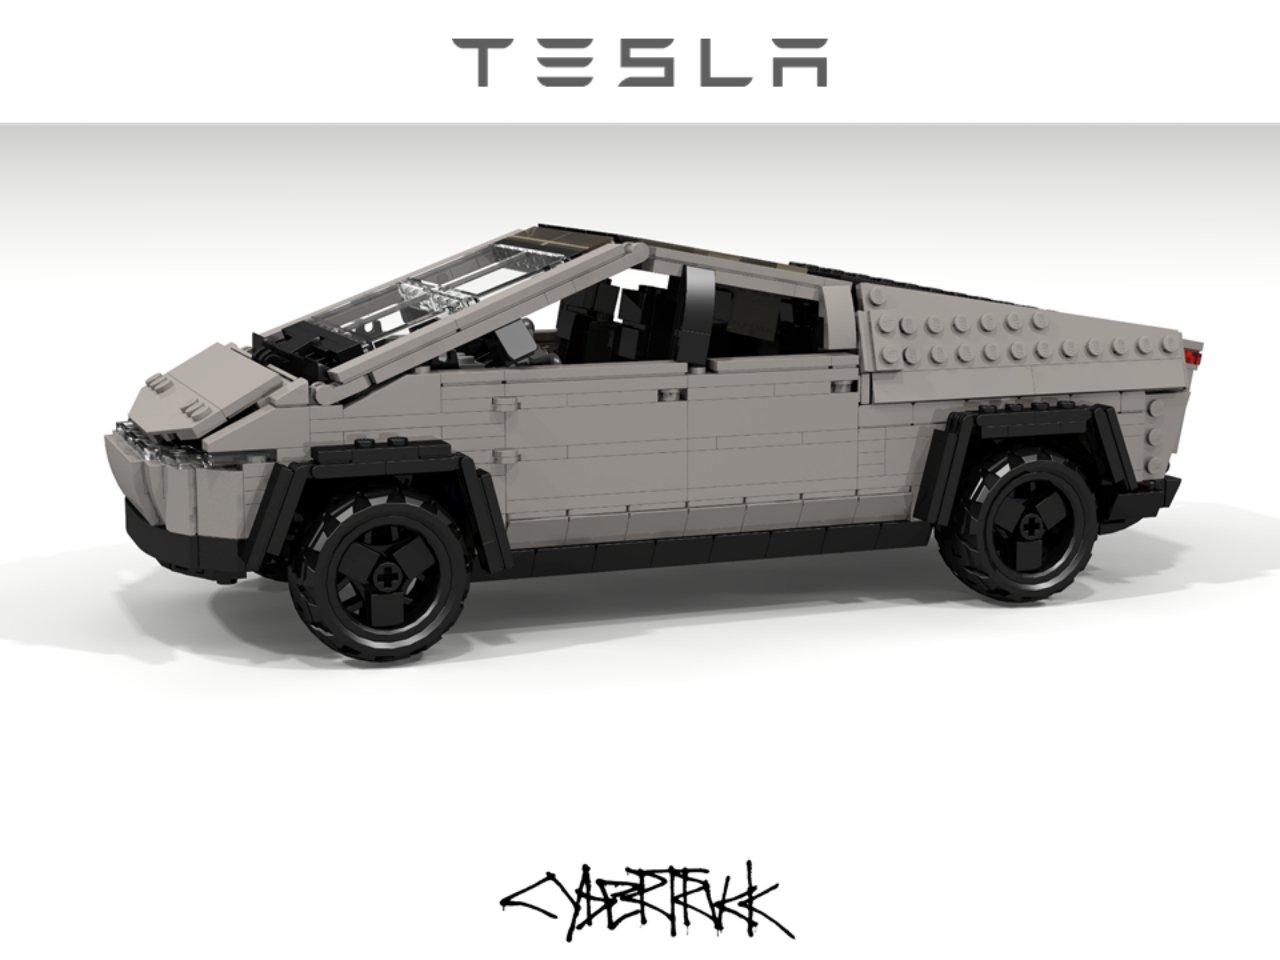 Tesla-Cybertruck-made-from-LEGO-bricks-4